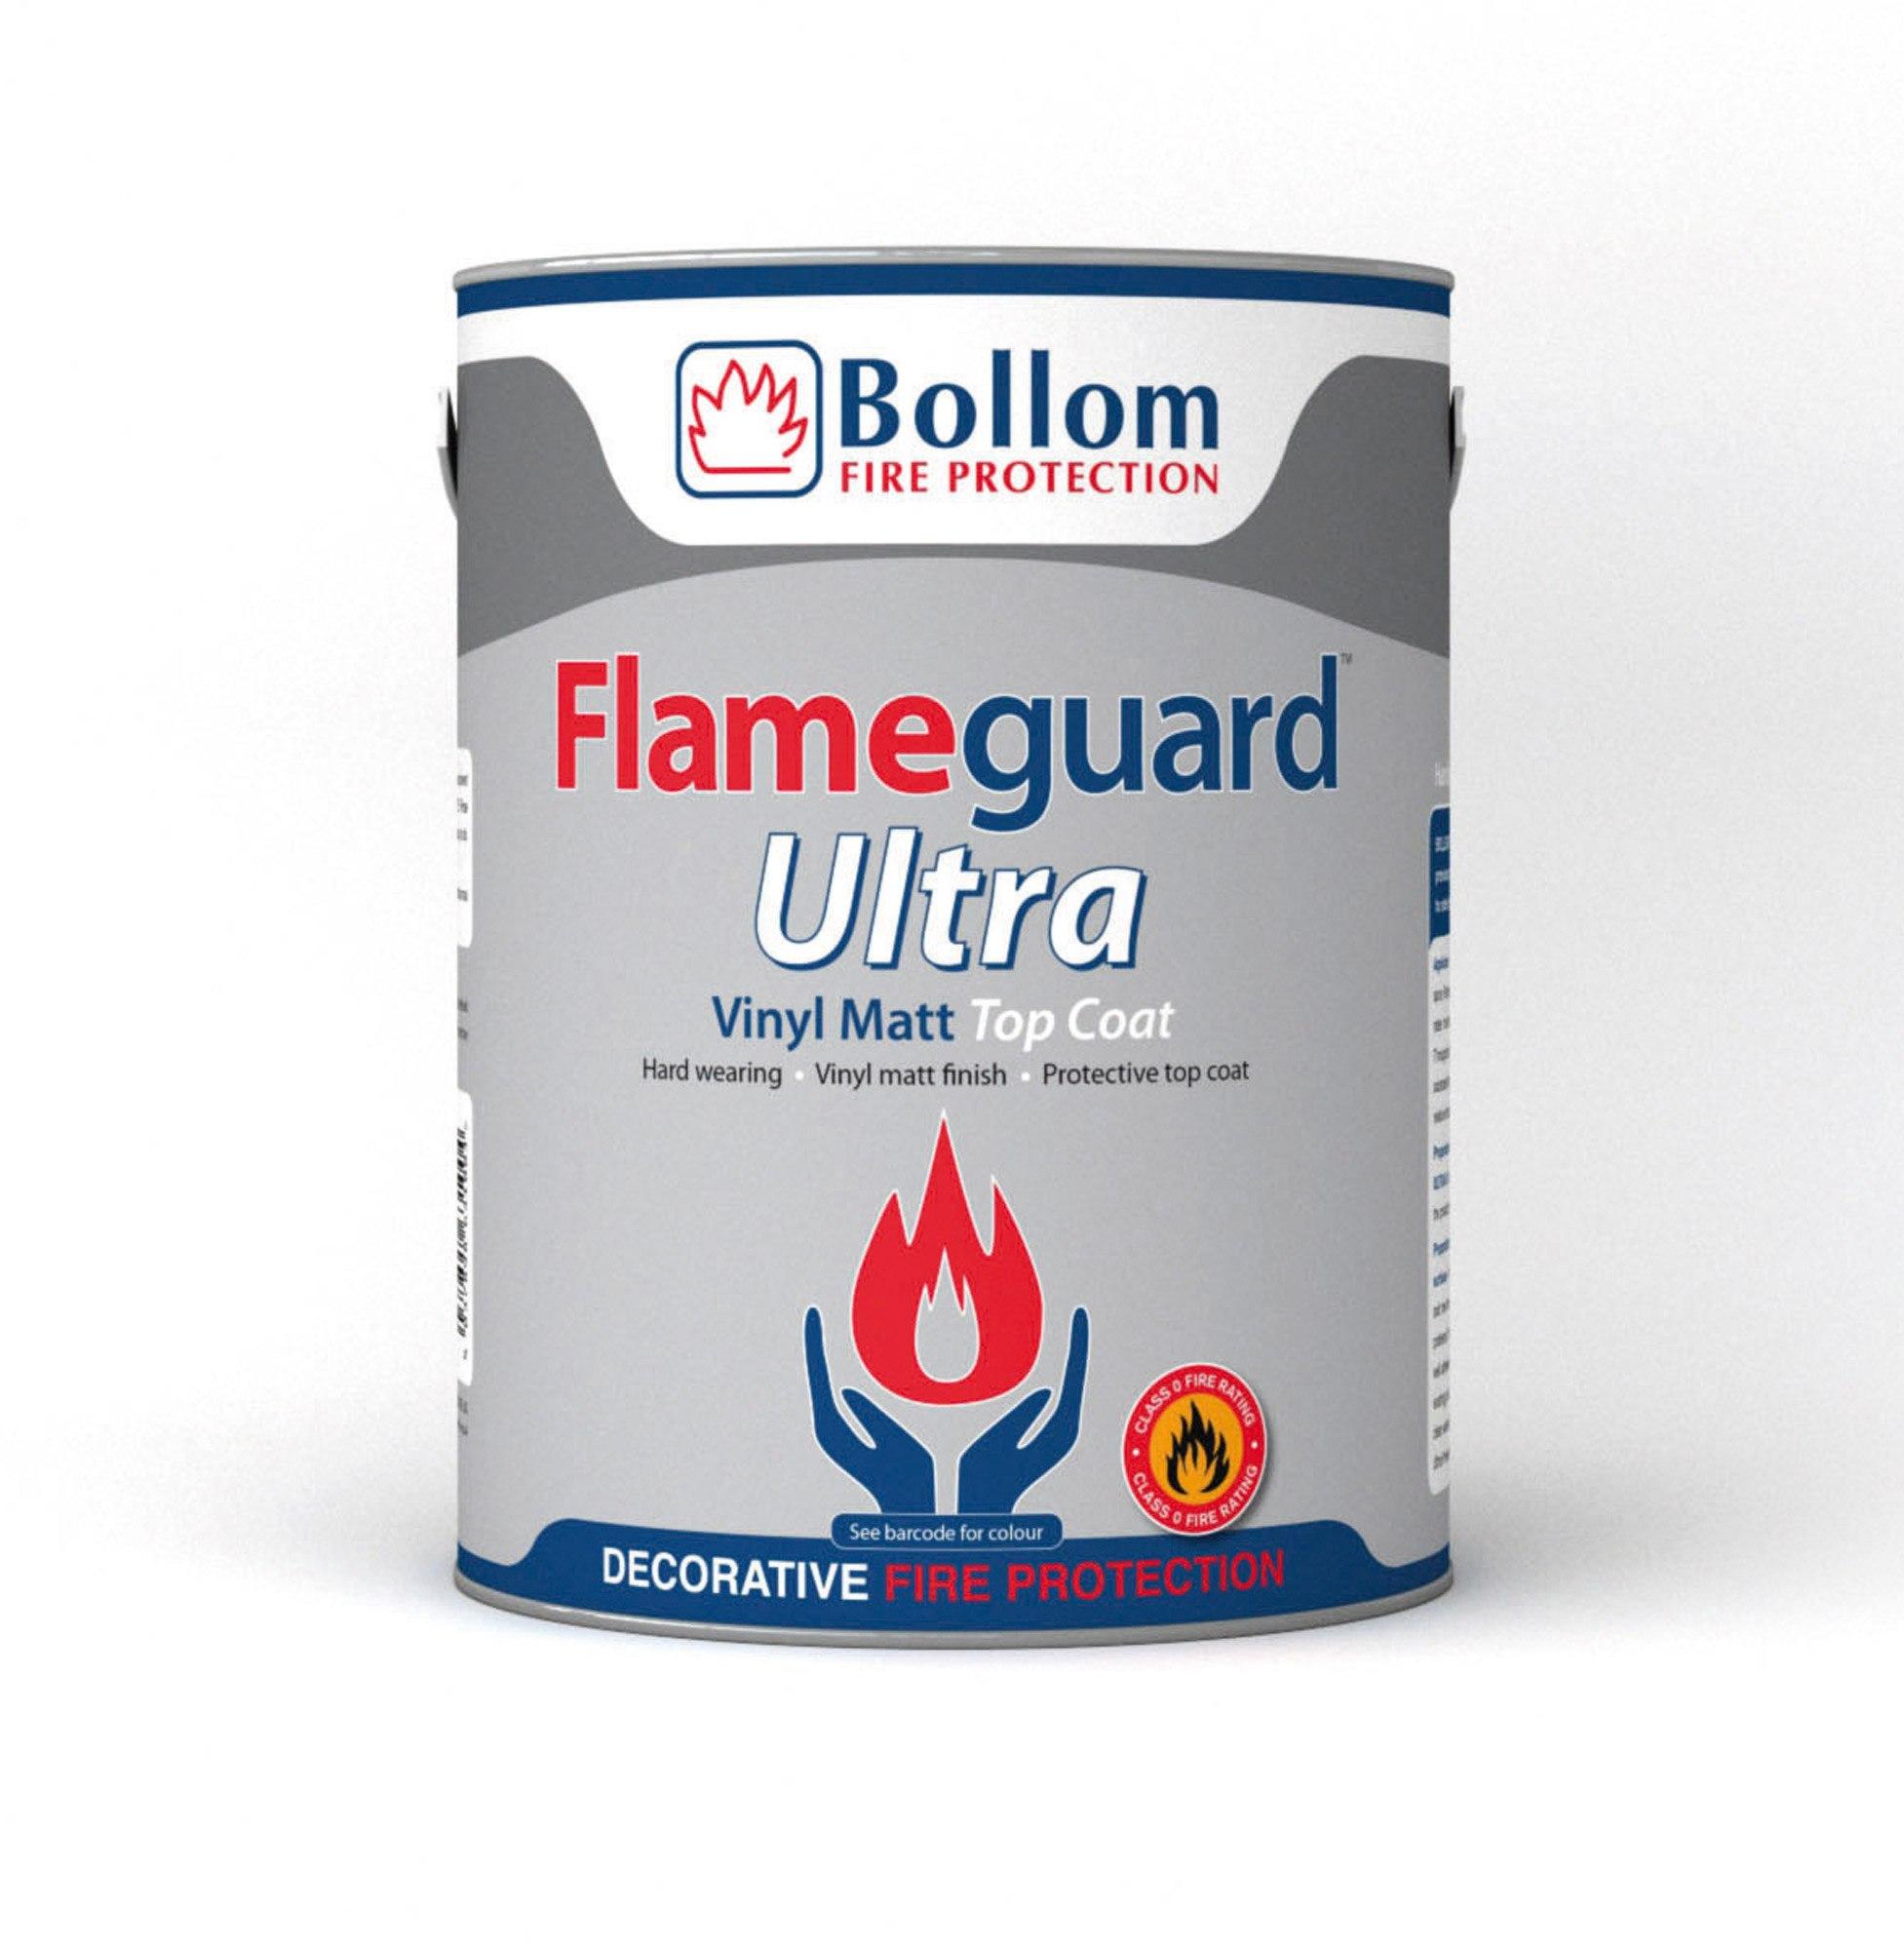 Flameguard Ultra topcoat